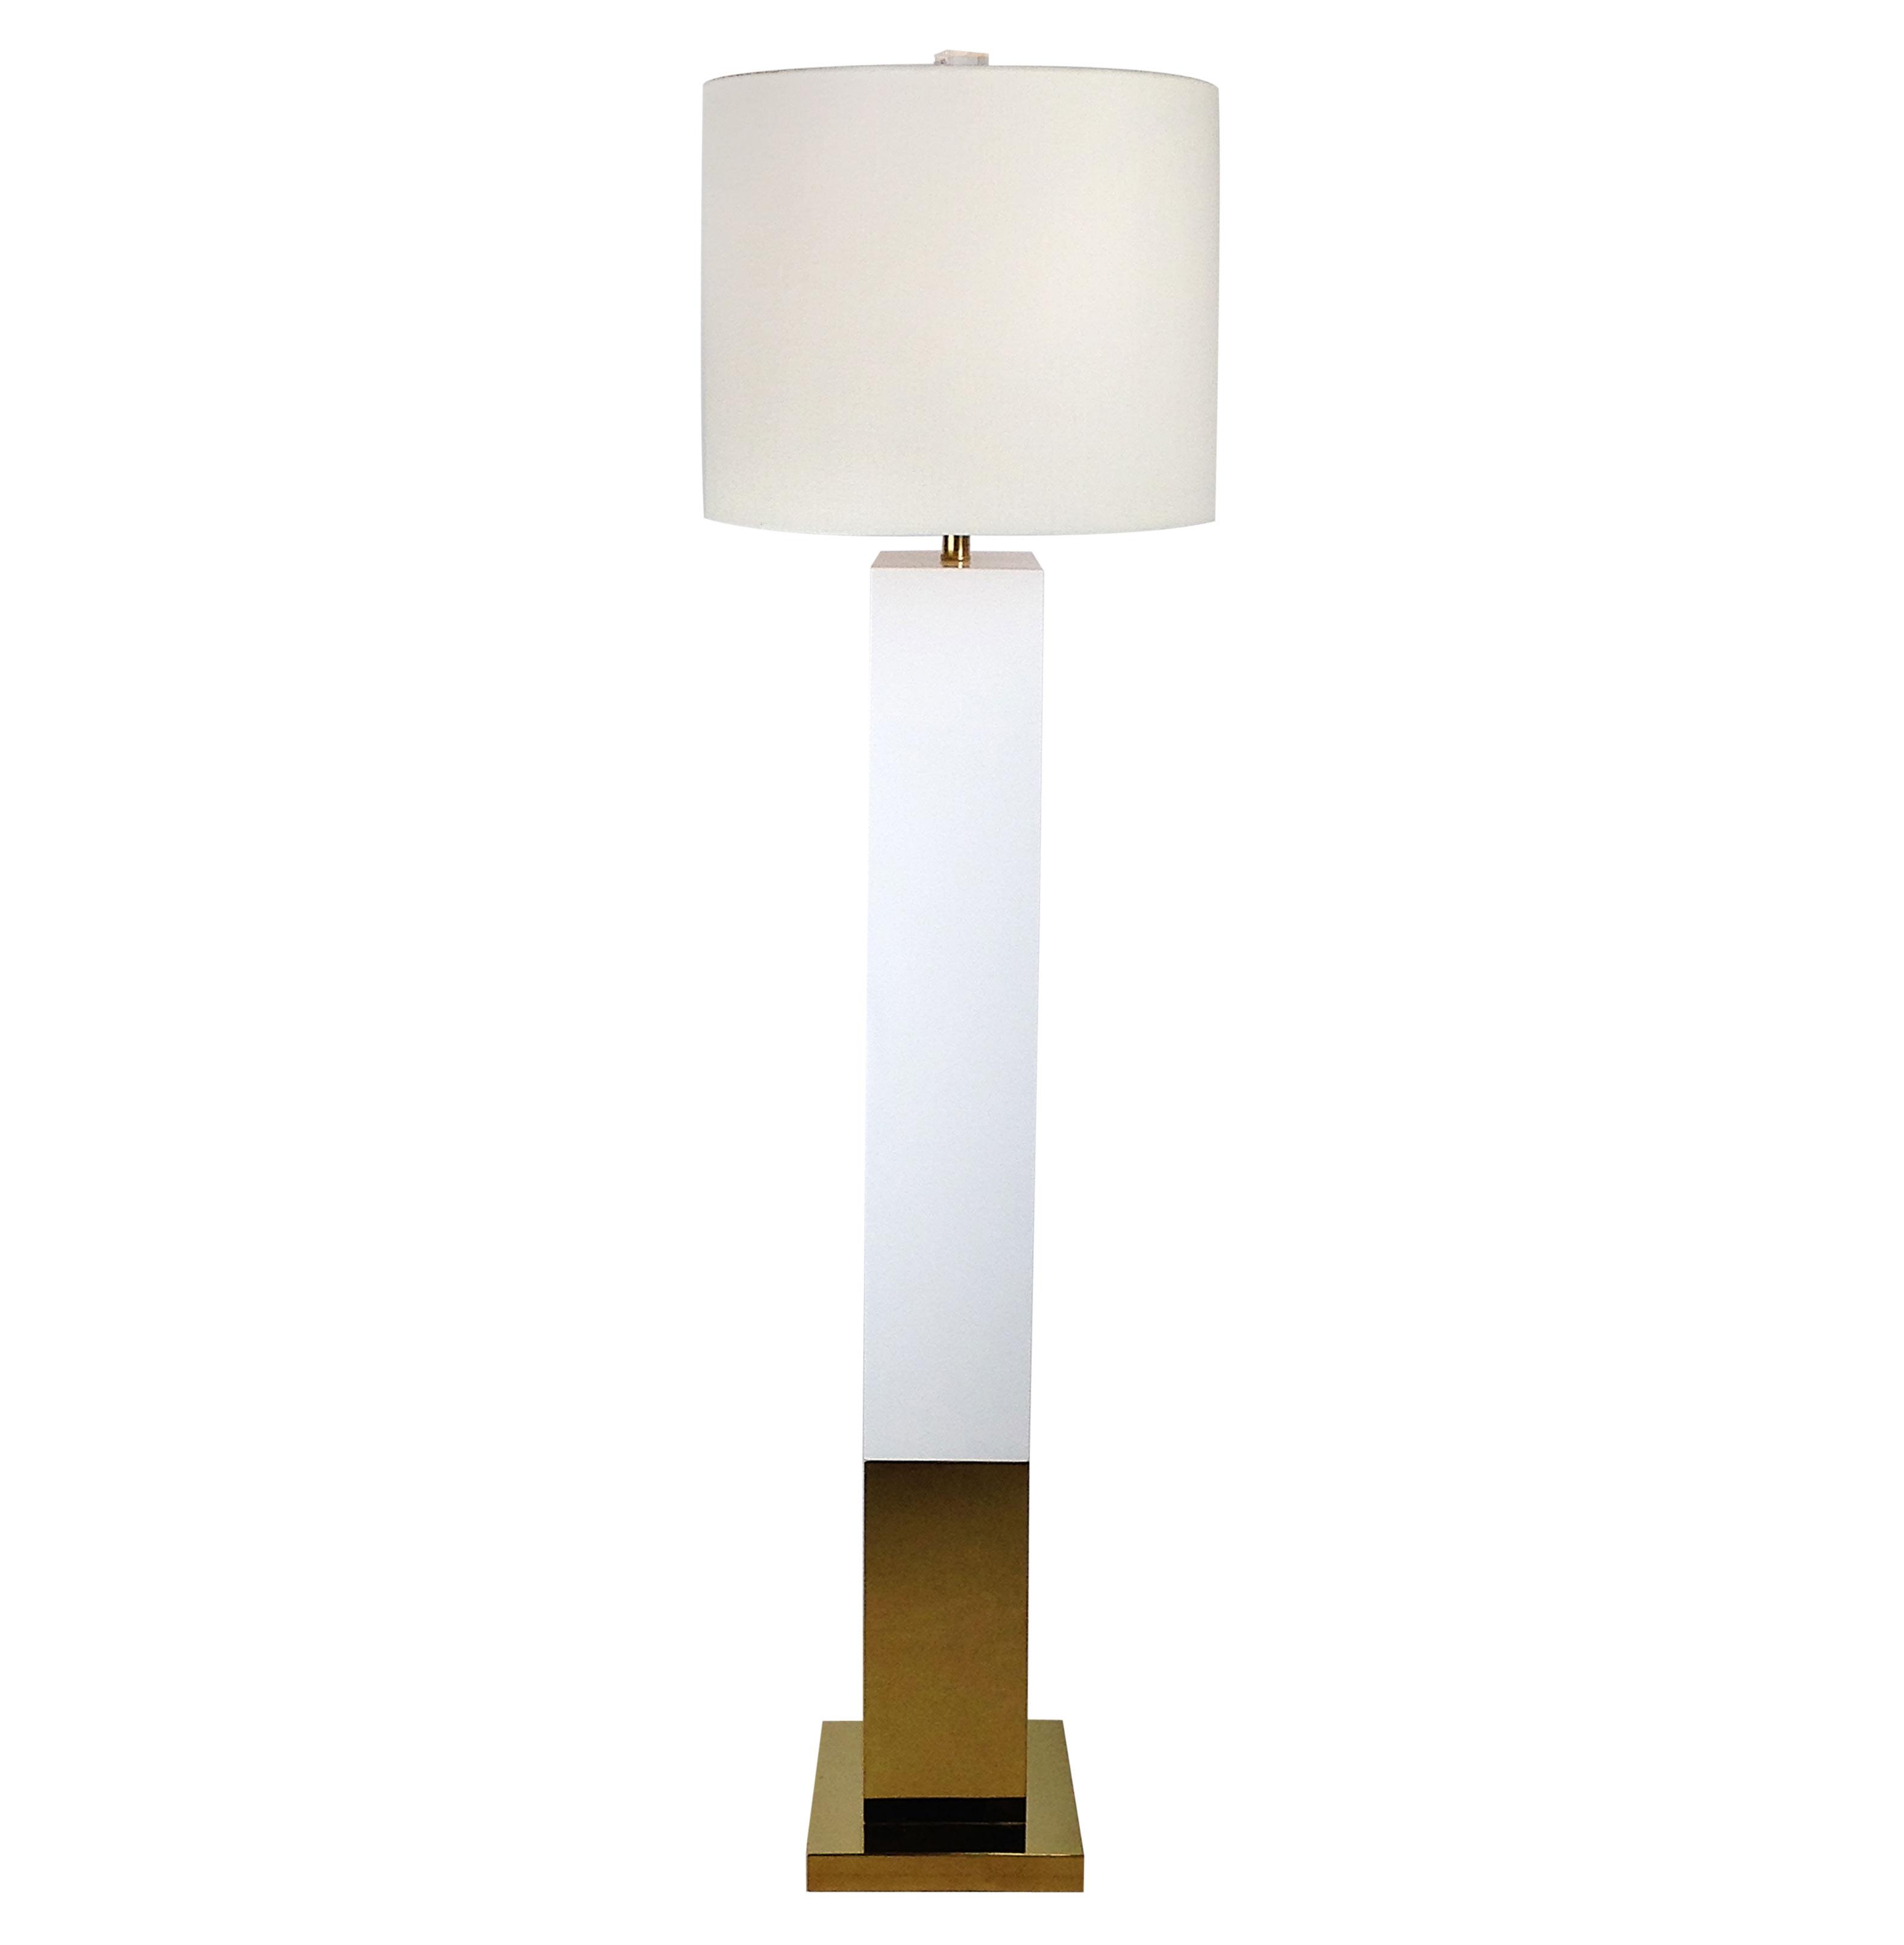 Titan Hollywood Regency Square Gold White Floor Lamp